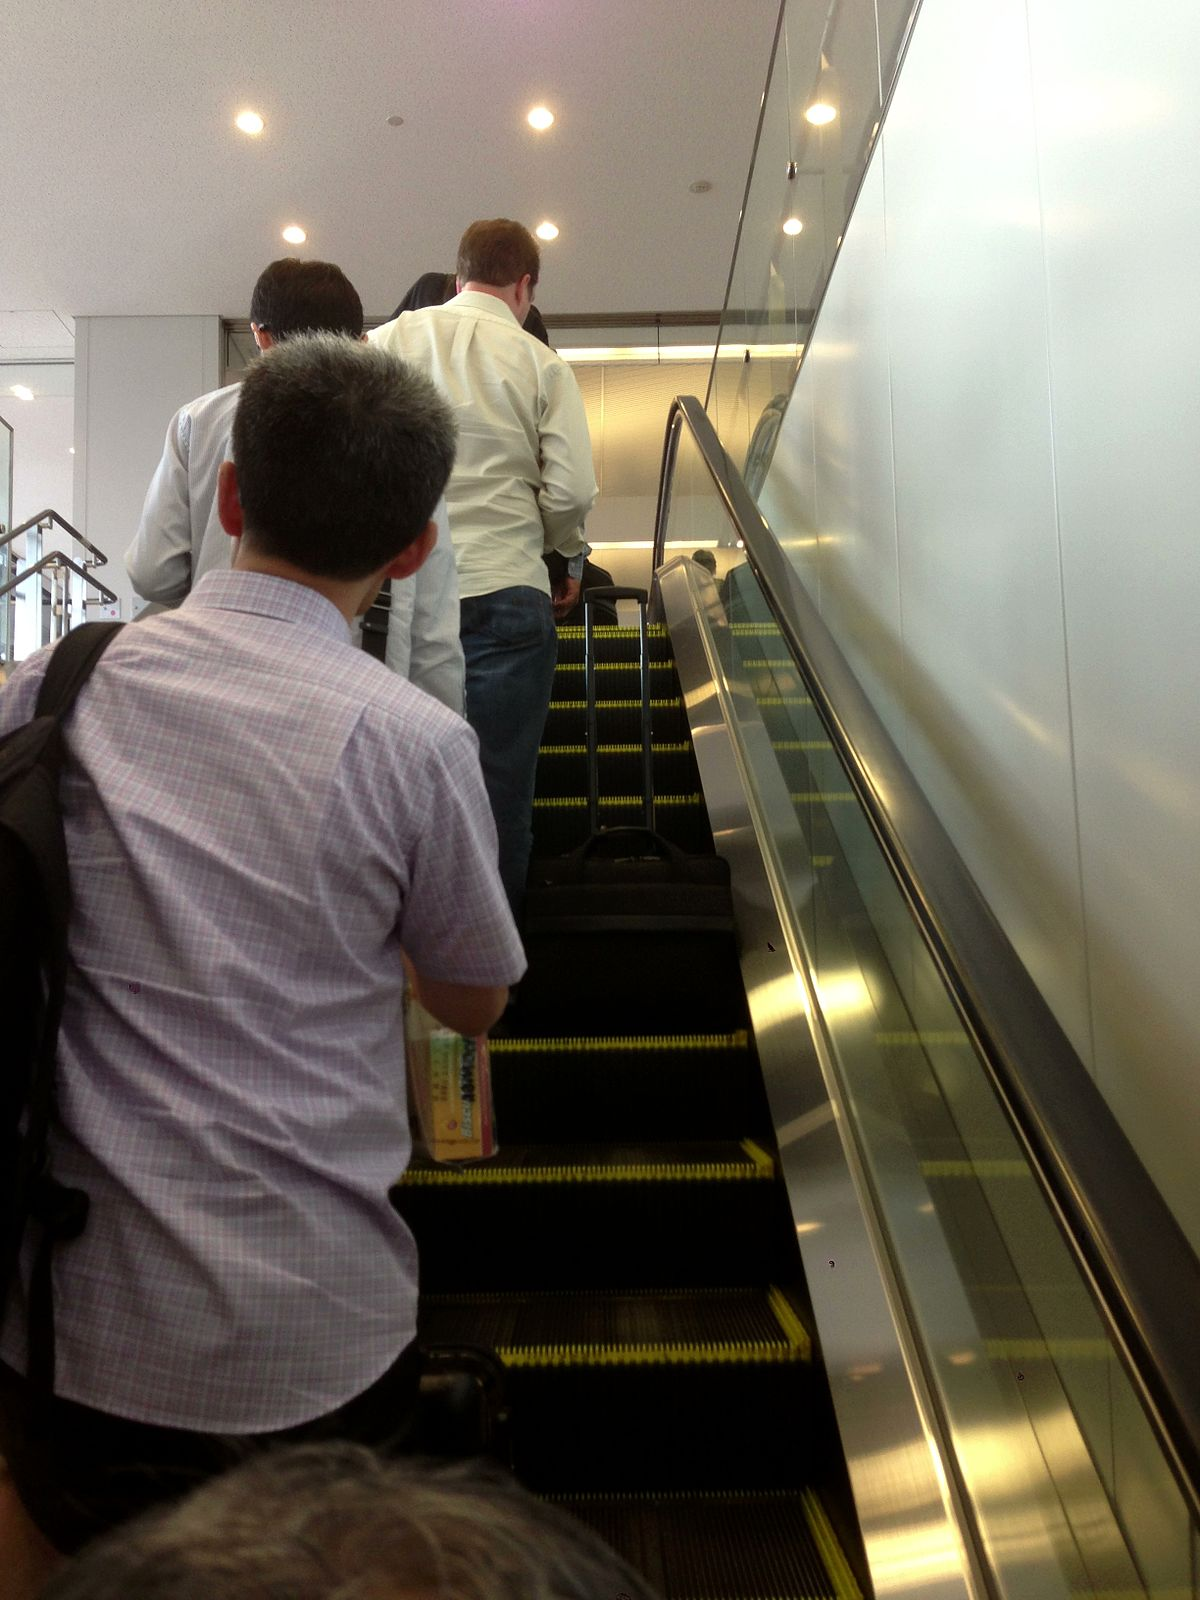 escalator etiquette wikipedia